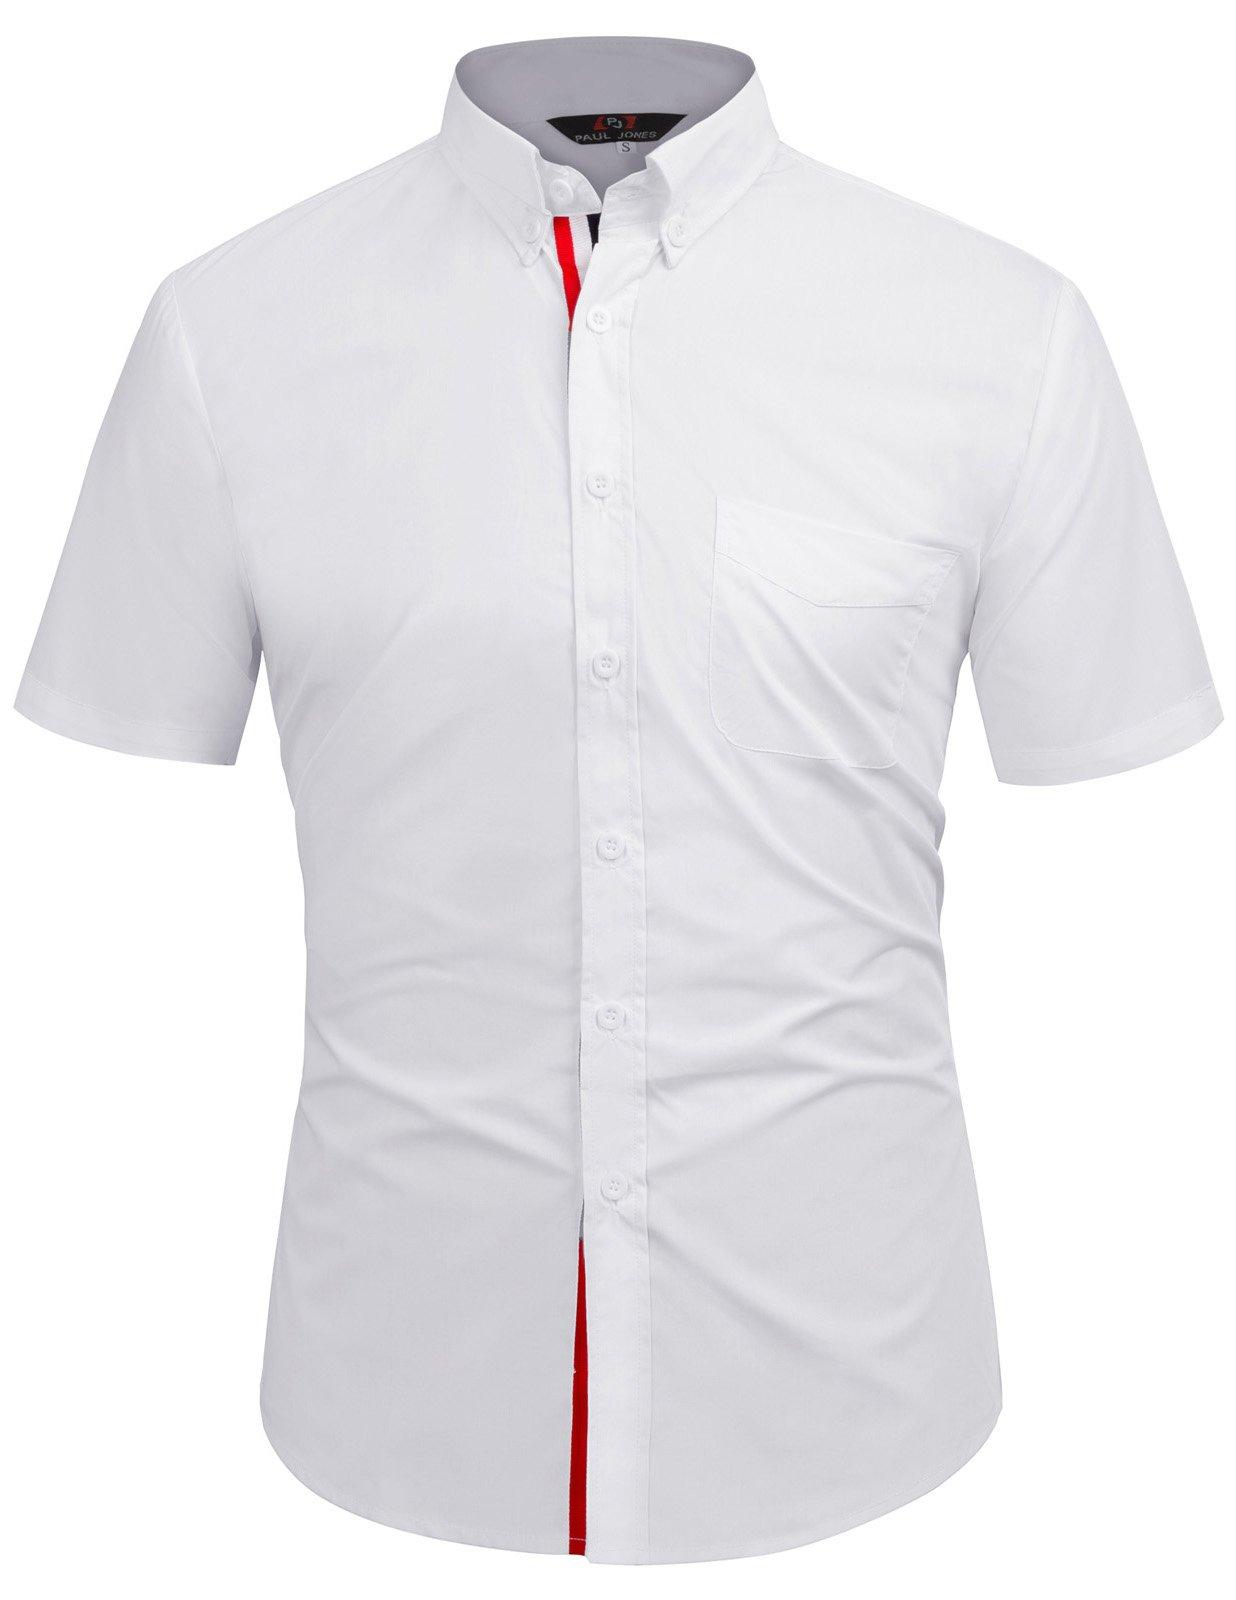 Men's Slim Business Shirts Botton Down KL-3,White,Medium